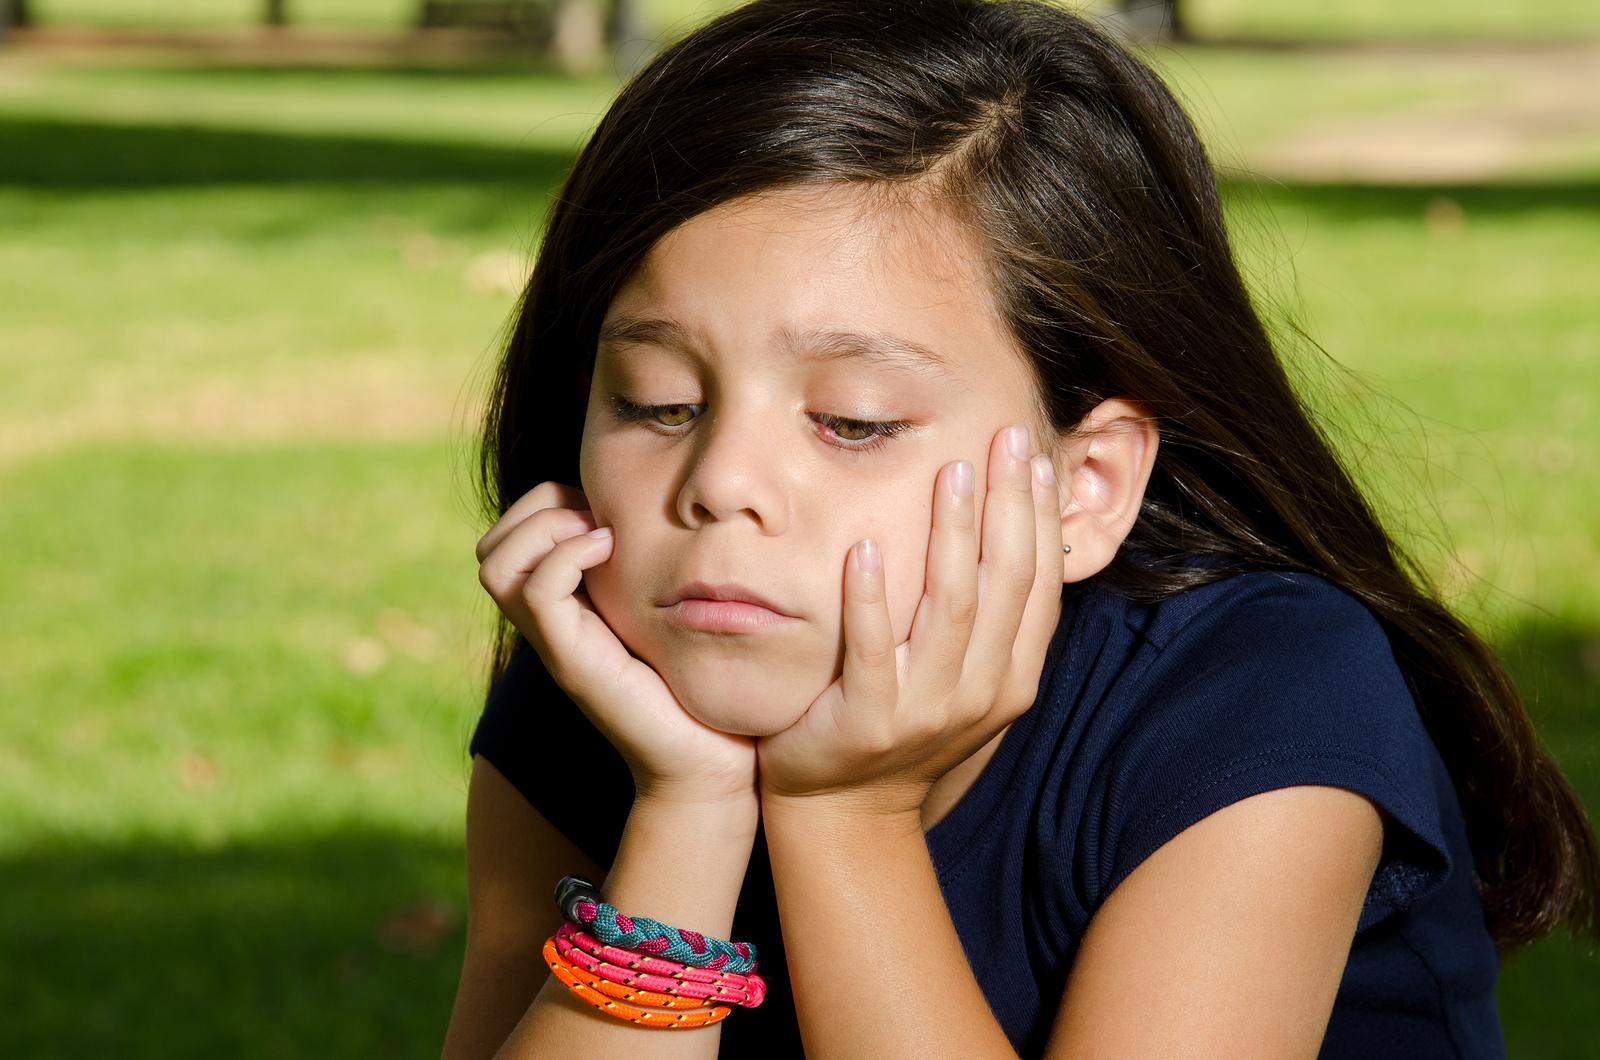 http://www.google.gr/imgres?imgurl=http%3A%2F%2Fwww.earlyinterventionsupport.com%2Fwp-content%2Fuploads%2F2013%2F12%2Fbigstock-Sad-Child-37696189.jpg&imgrefurl=http%3A%2F%2Fwww.earlyinterventionsupport.com%2Fcan-tell-child-dyslexic-treatment-options%2F&h=1060&w=1600&tbnid=KgumpskVYBAkqM%3A&zoom=1&docid=U52nBYSX-TCIPM&ei=OeIuVOLeNofpywPGhoAQ&tbm=isch&ved=0CH0QMyhYMFg&iact=rc&uact=3&dur=682&page=5&start=82&ndsp=23